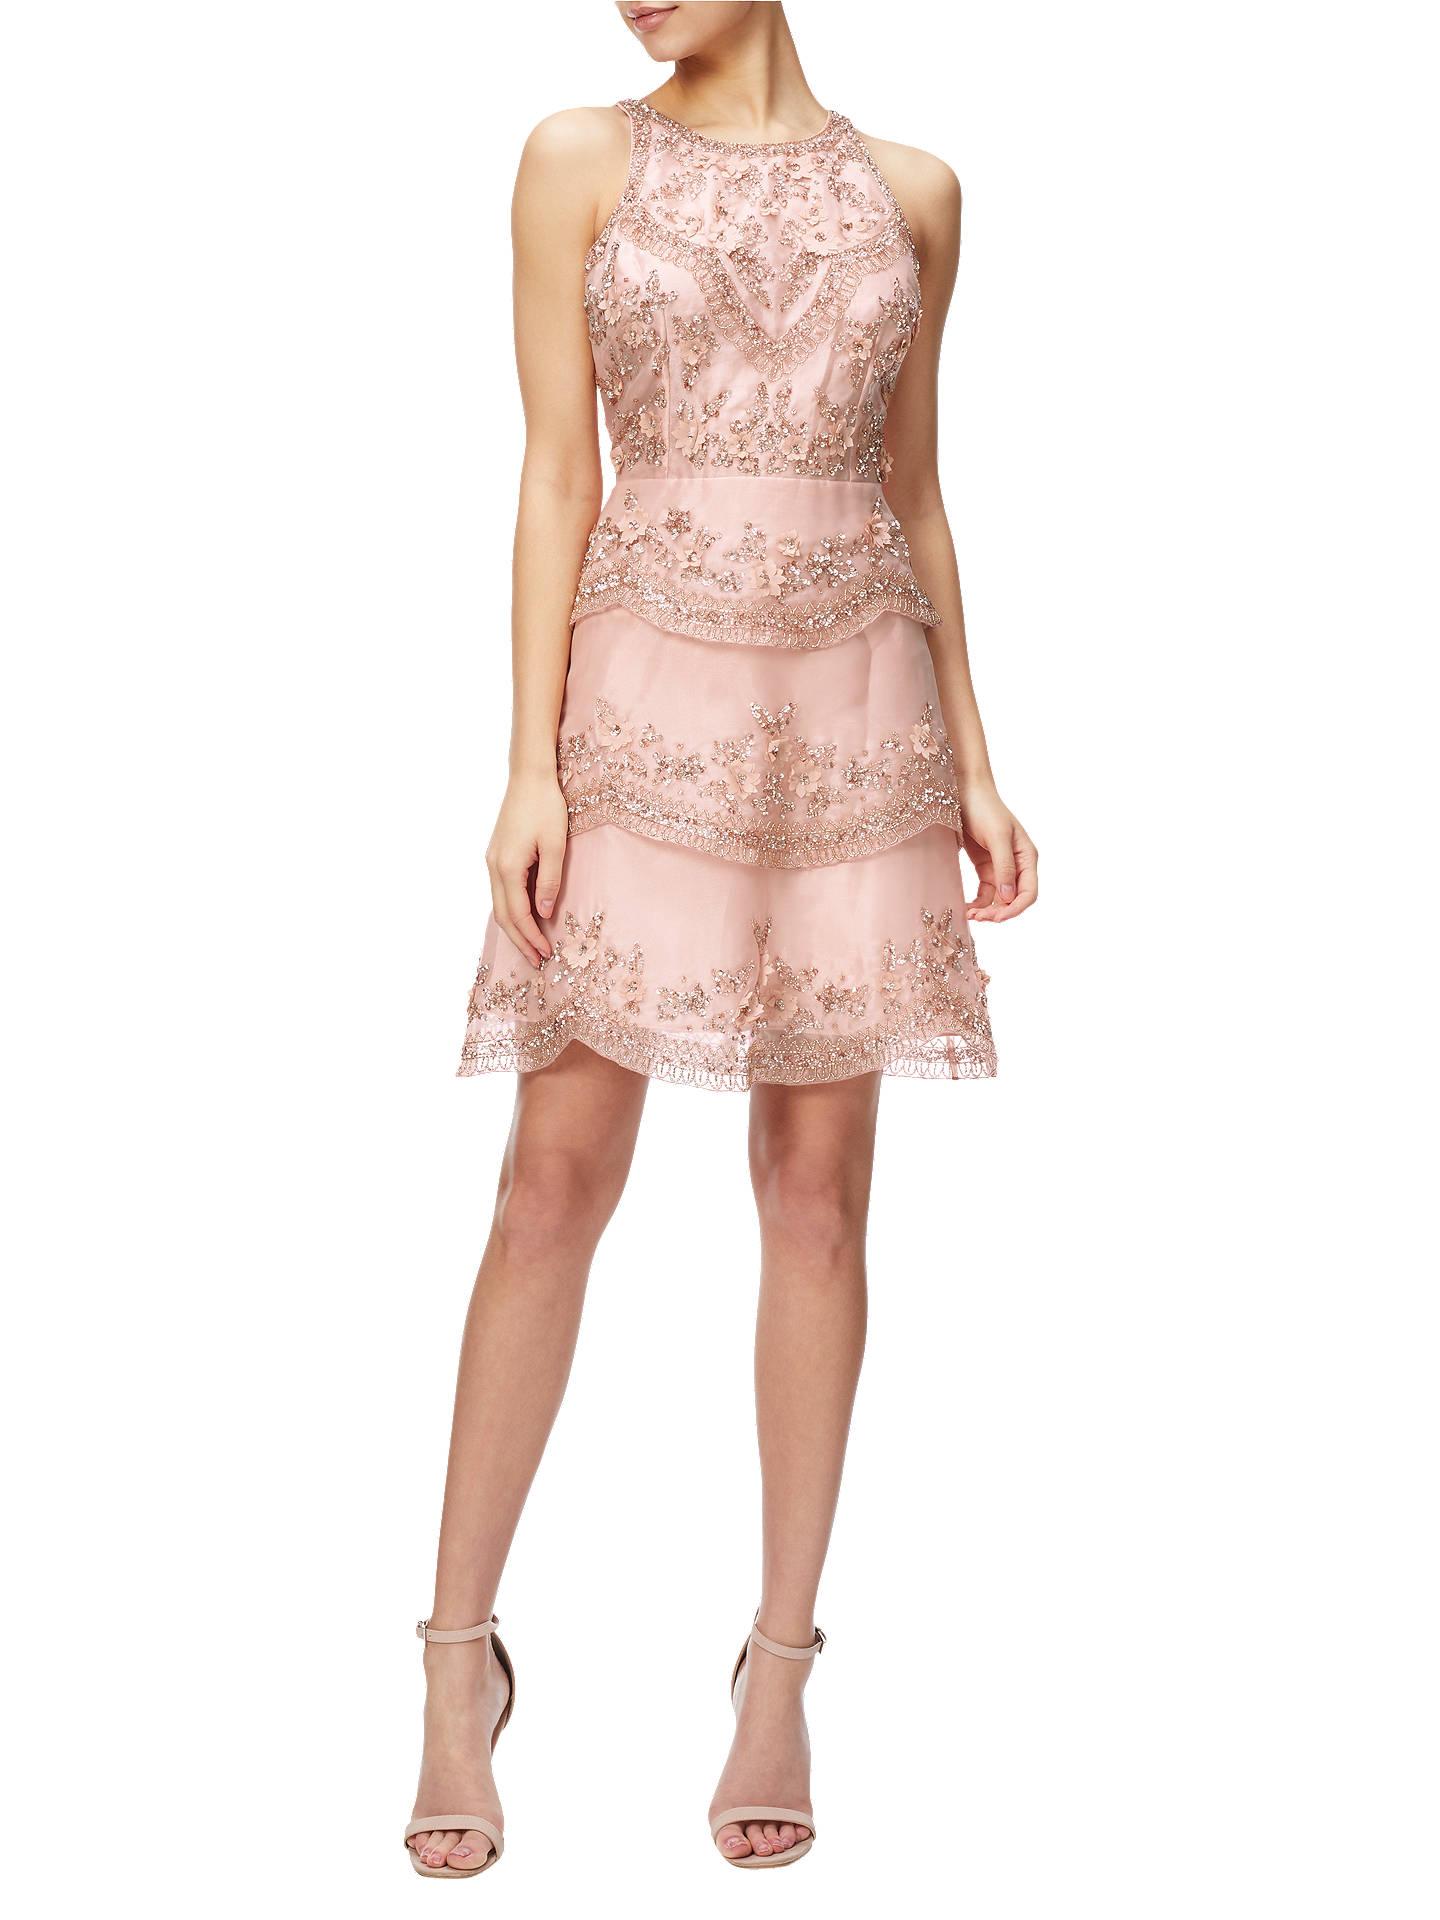 ce353f05291 Buy Adrianna Papell Halterneck Beaded Cocktail Dress